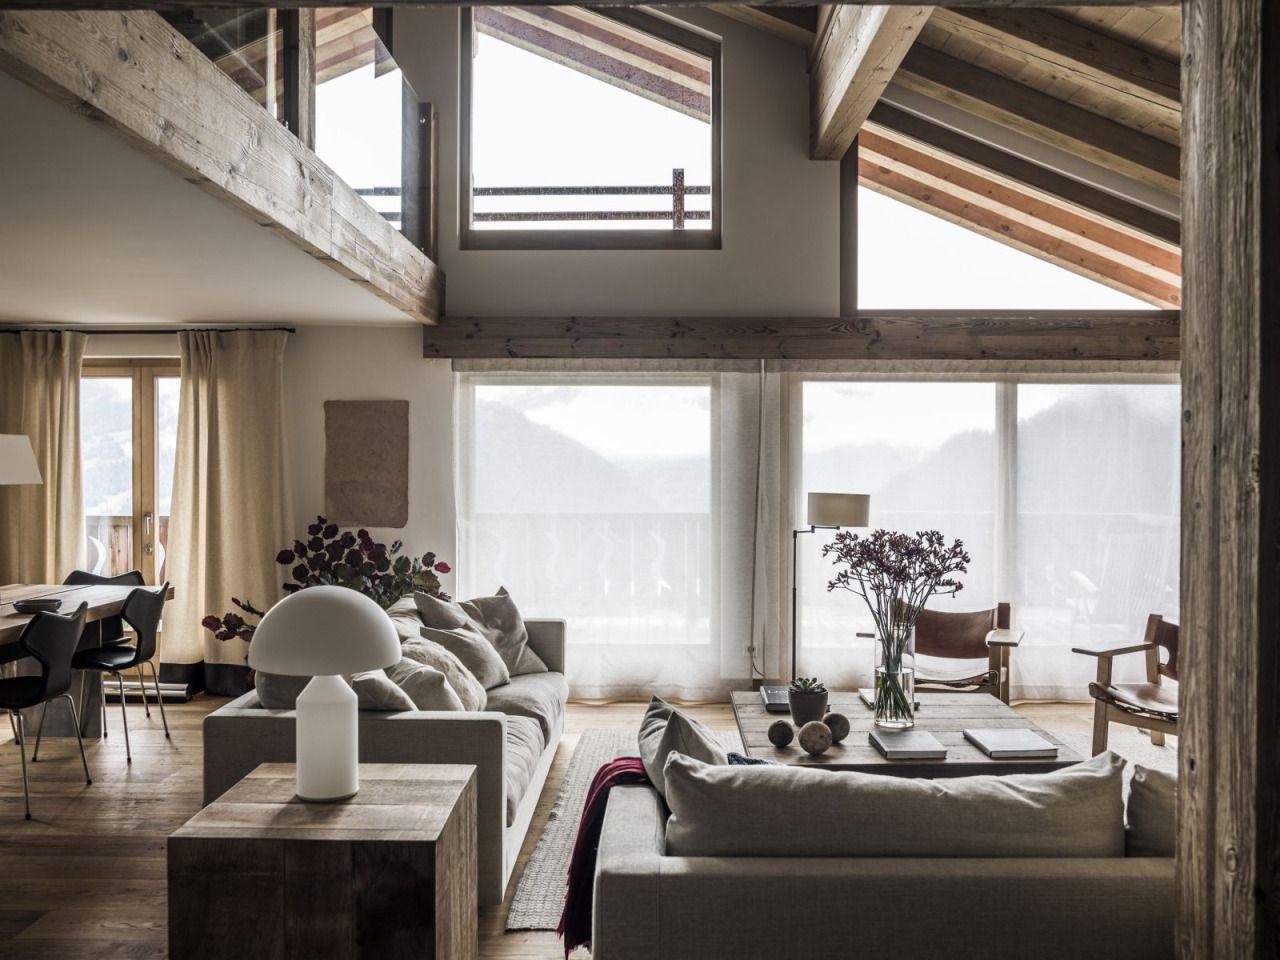 Interior design hd also pinterest thuis meubels and projecten rh nl